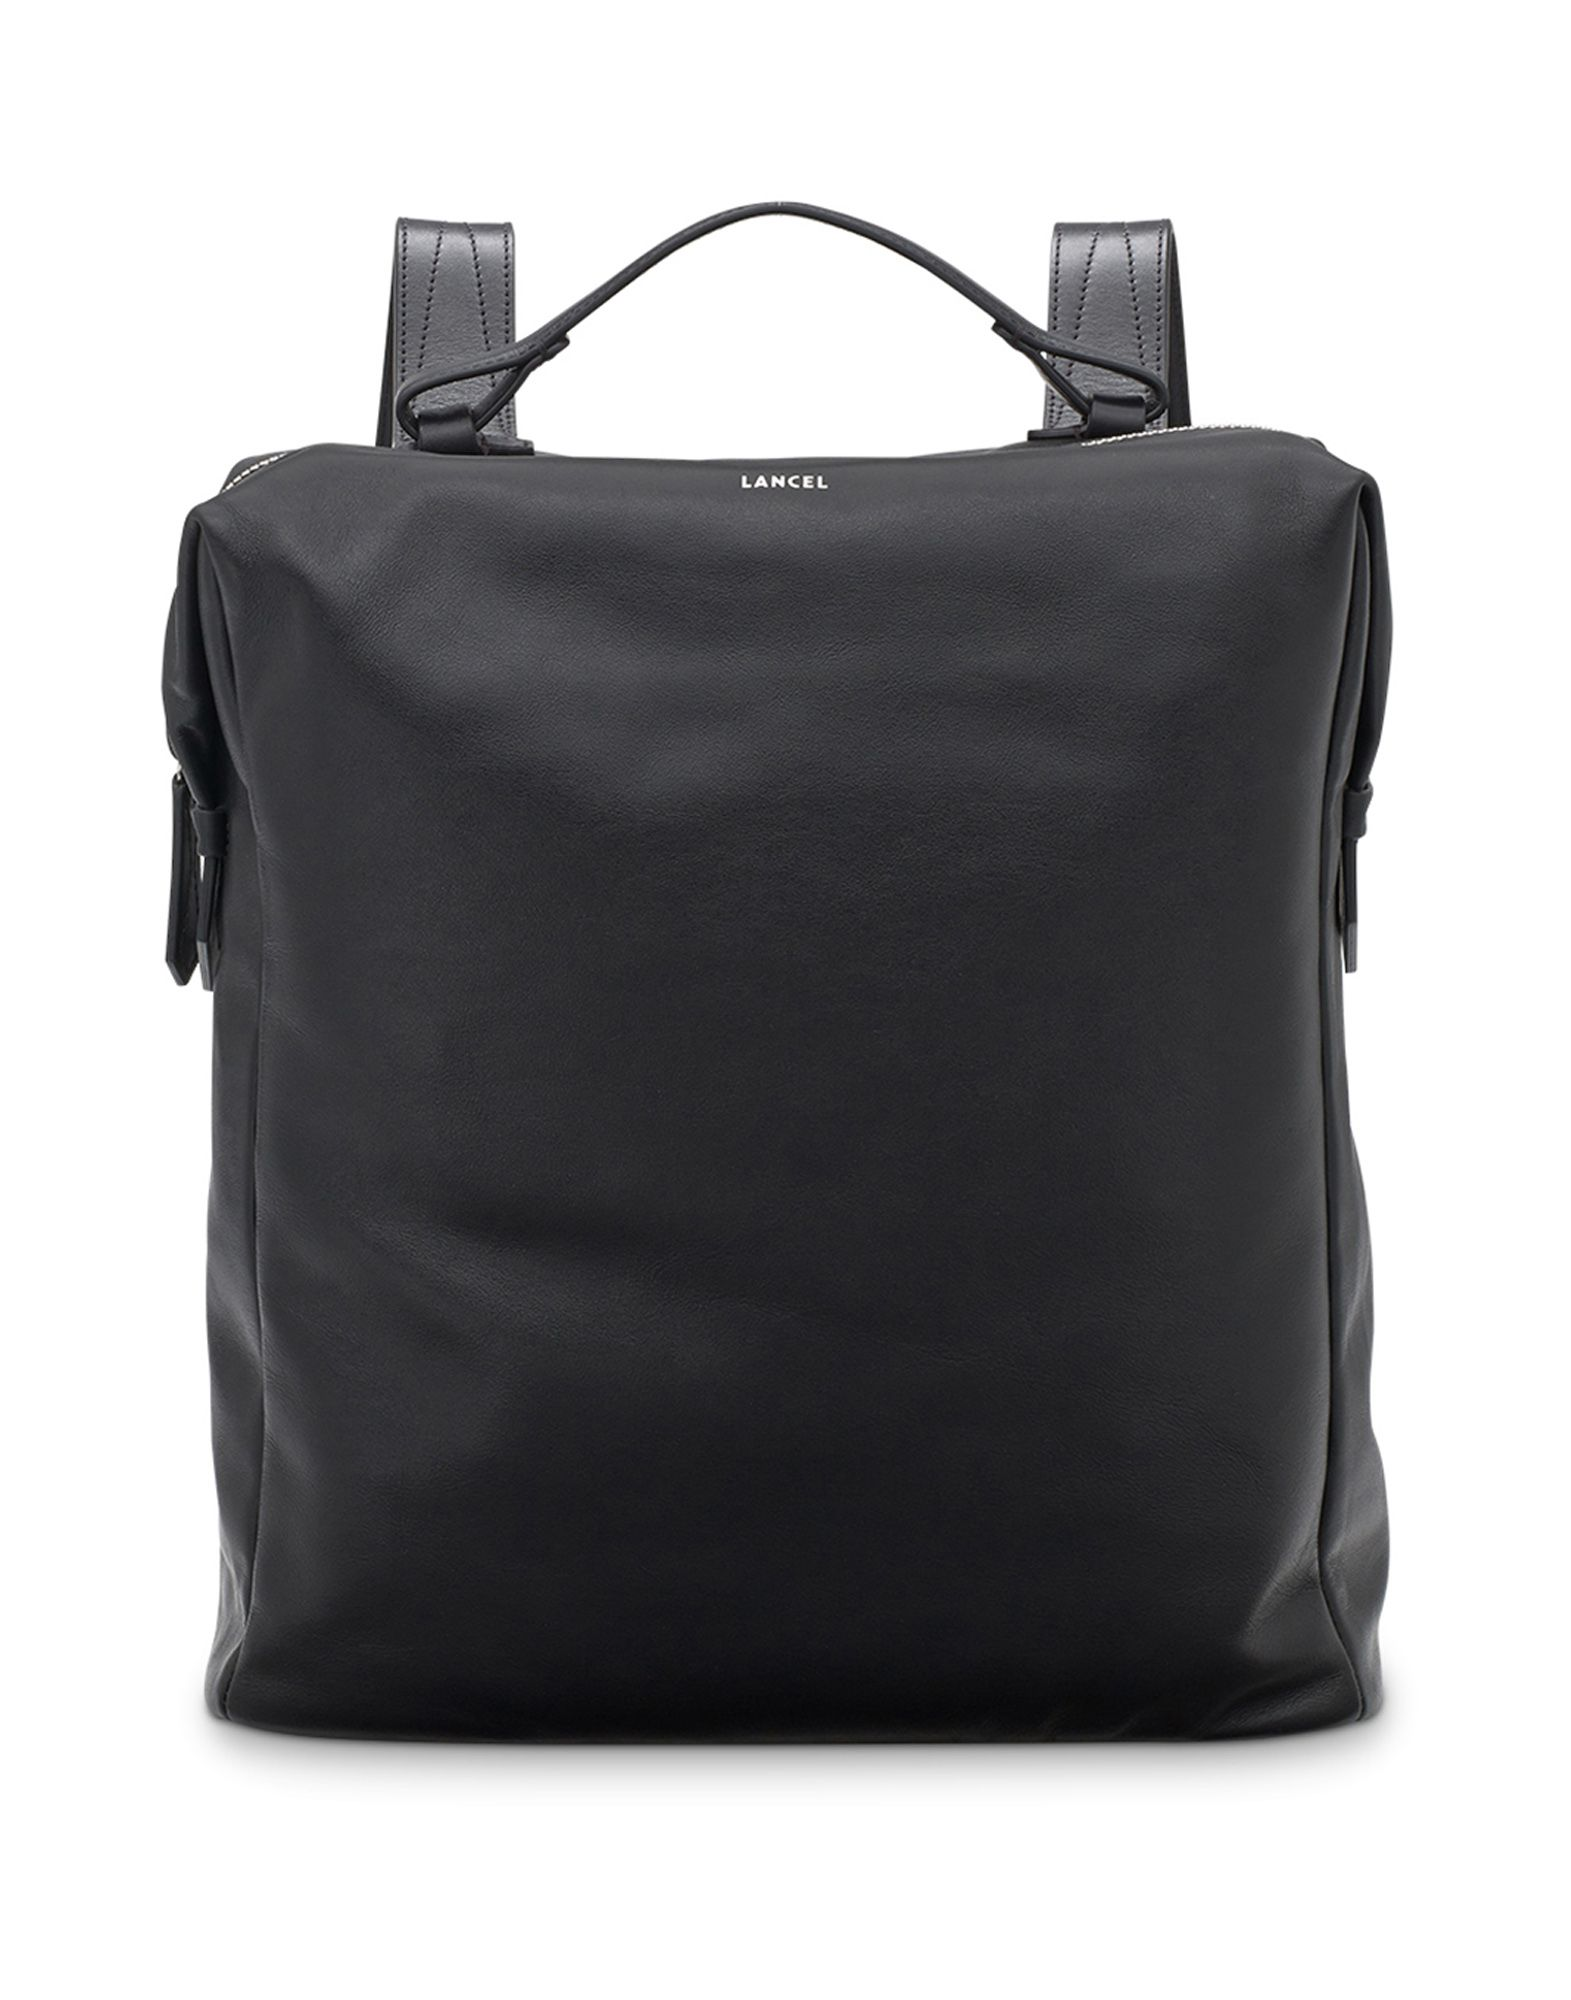 LANCEL Рюкзаки и сумки на пояс чехлы и сумки для планшетов